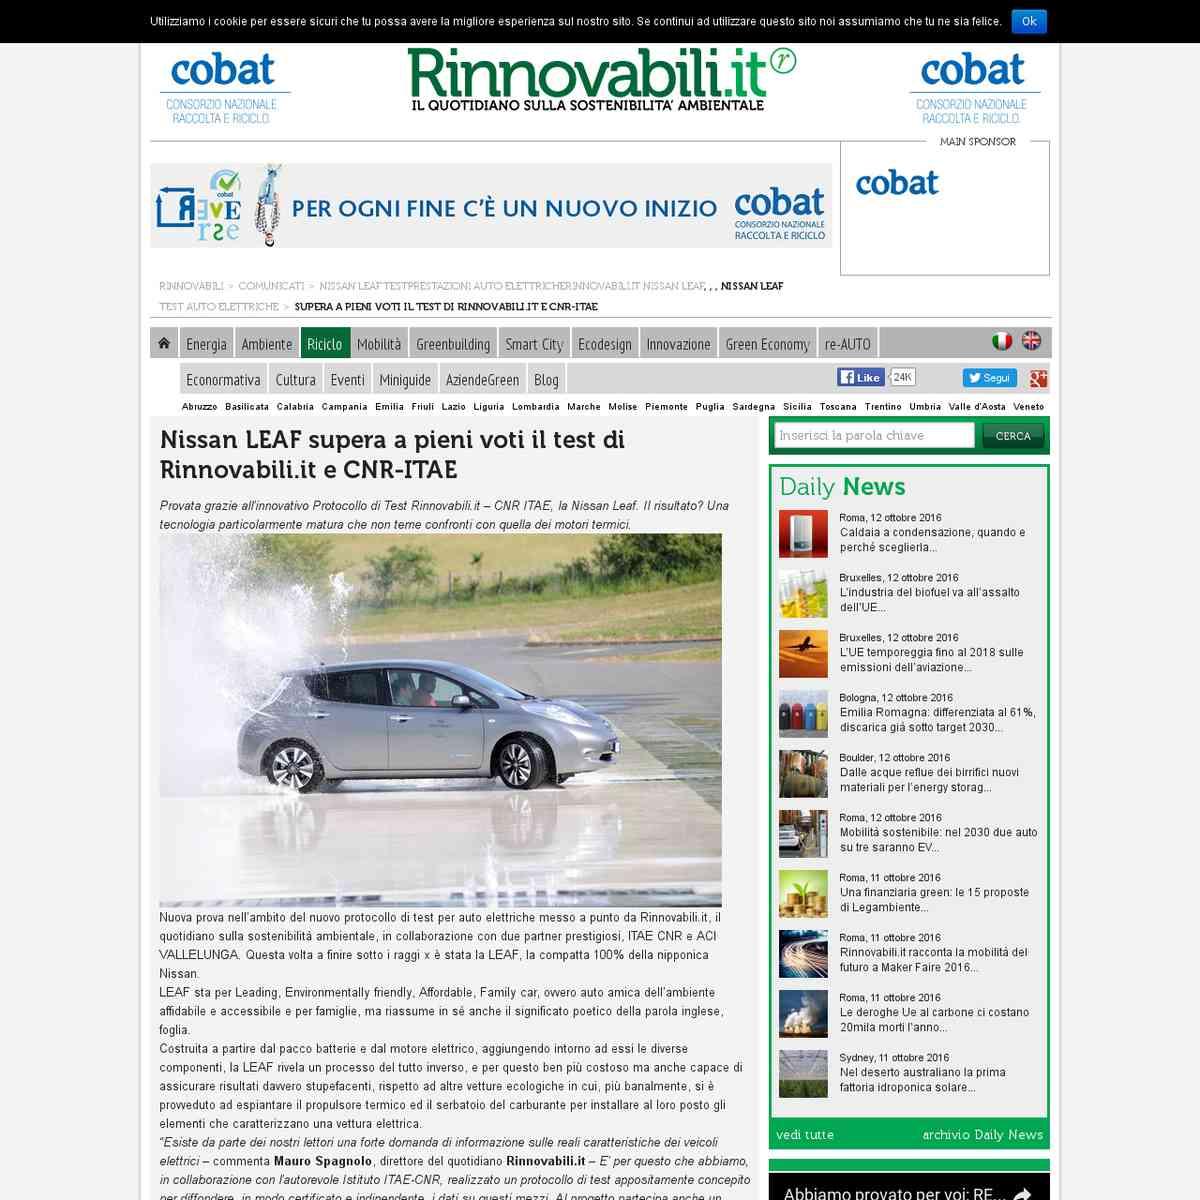 Nissan Leaf Test: Protocollo di Test Rinnovabili.it - CNR ITAE